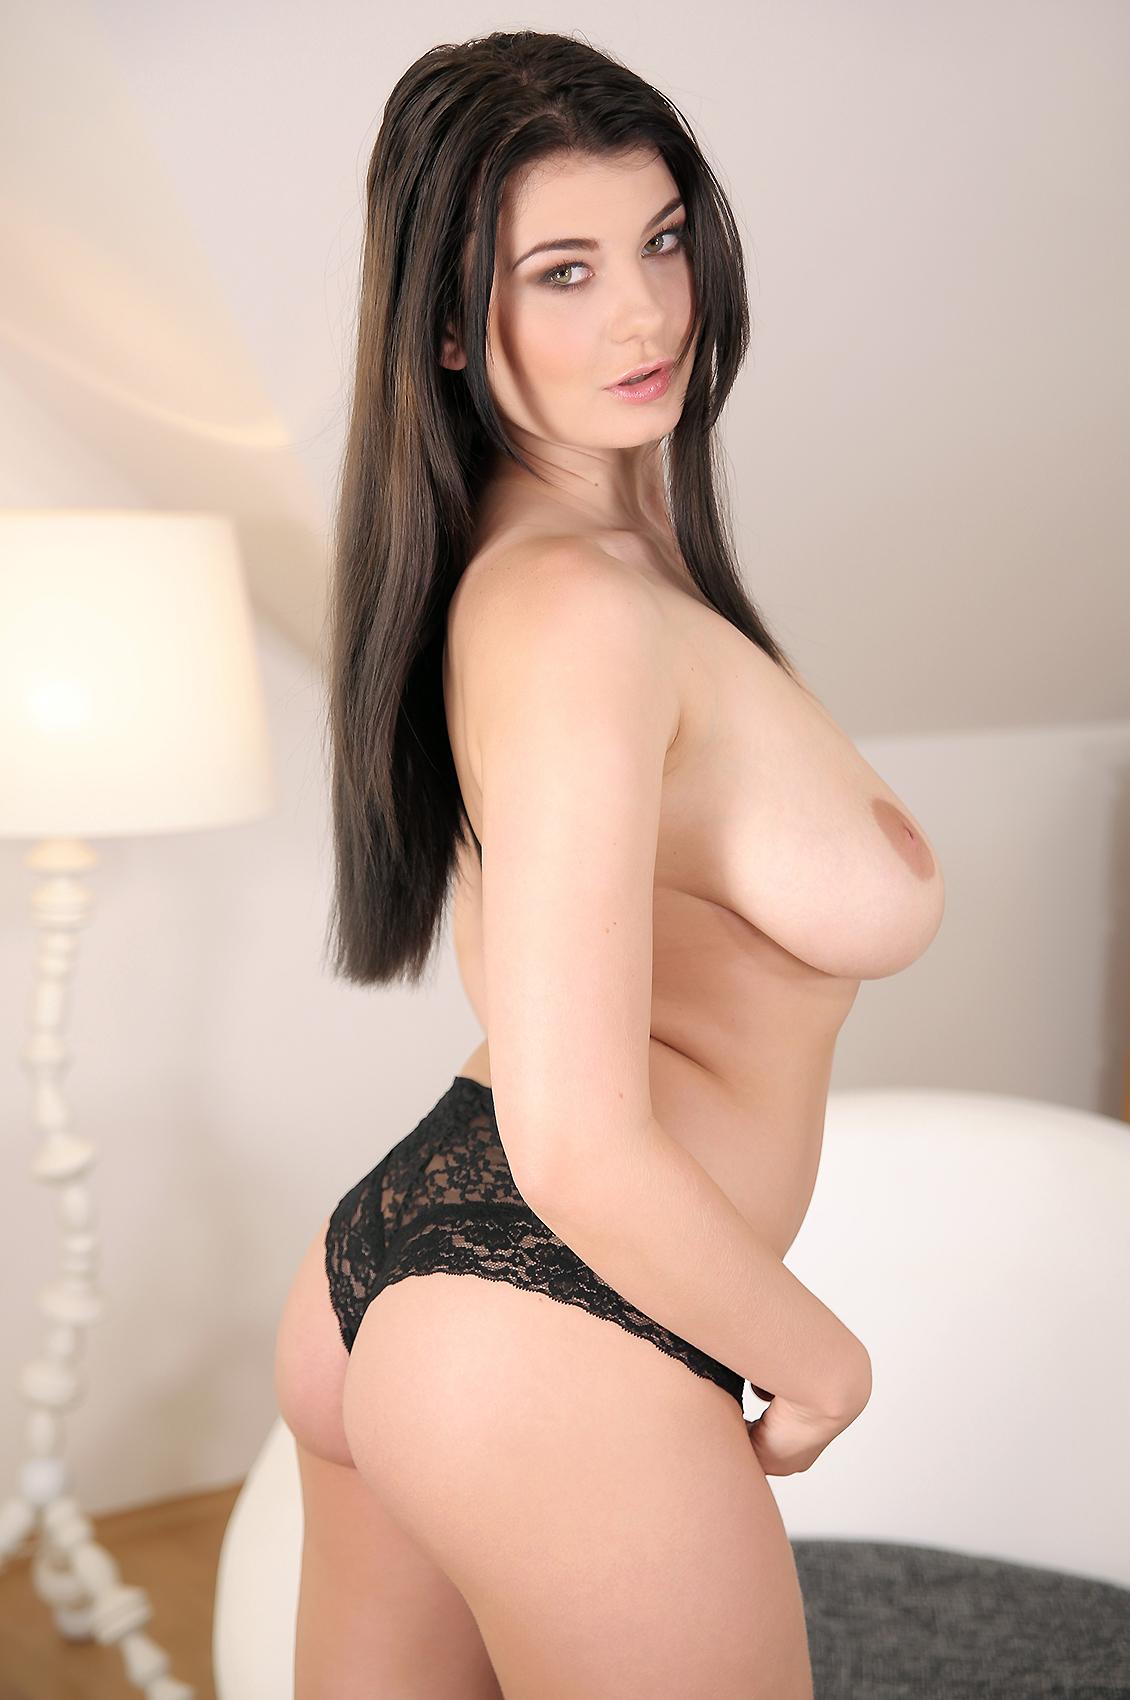 Lucy Li's VR Porn Videos, Bio & Free Nude Pics